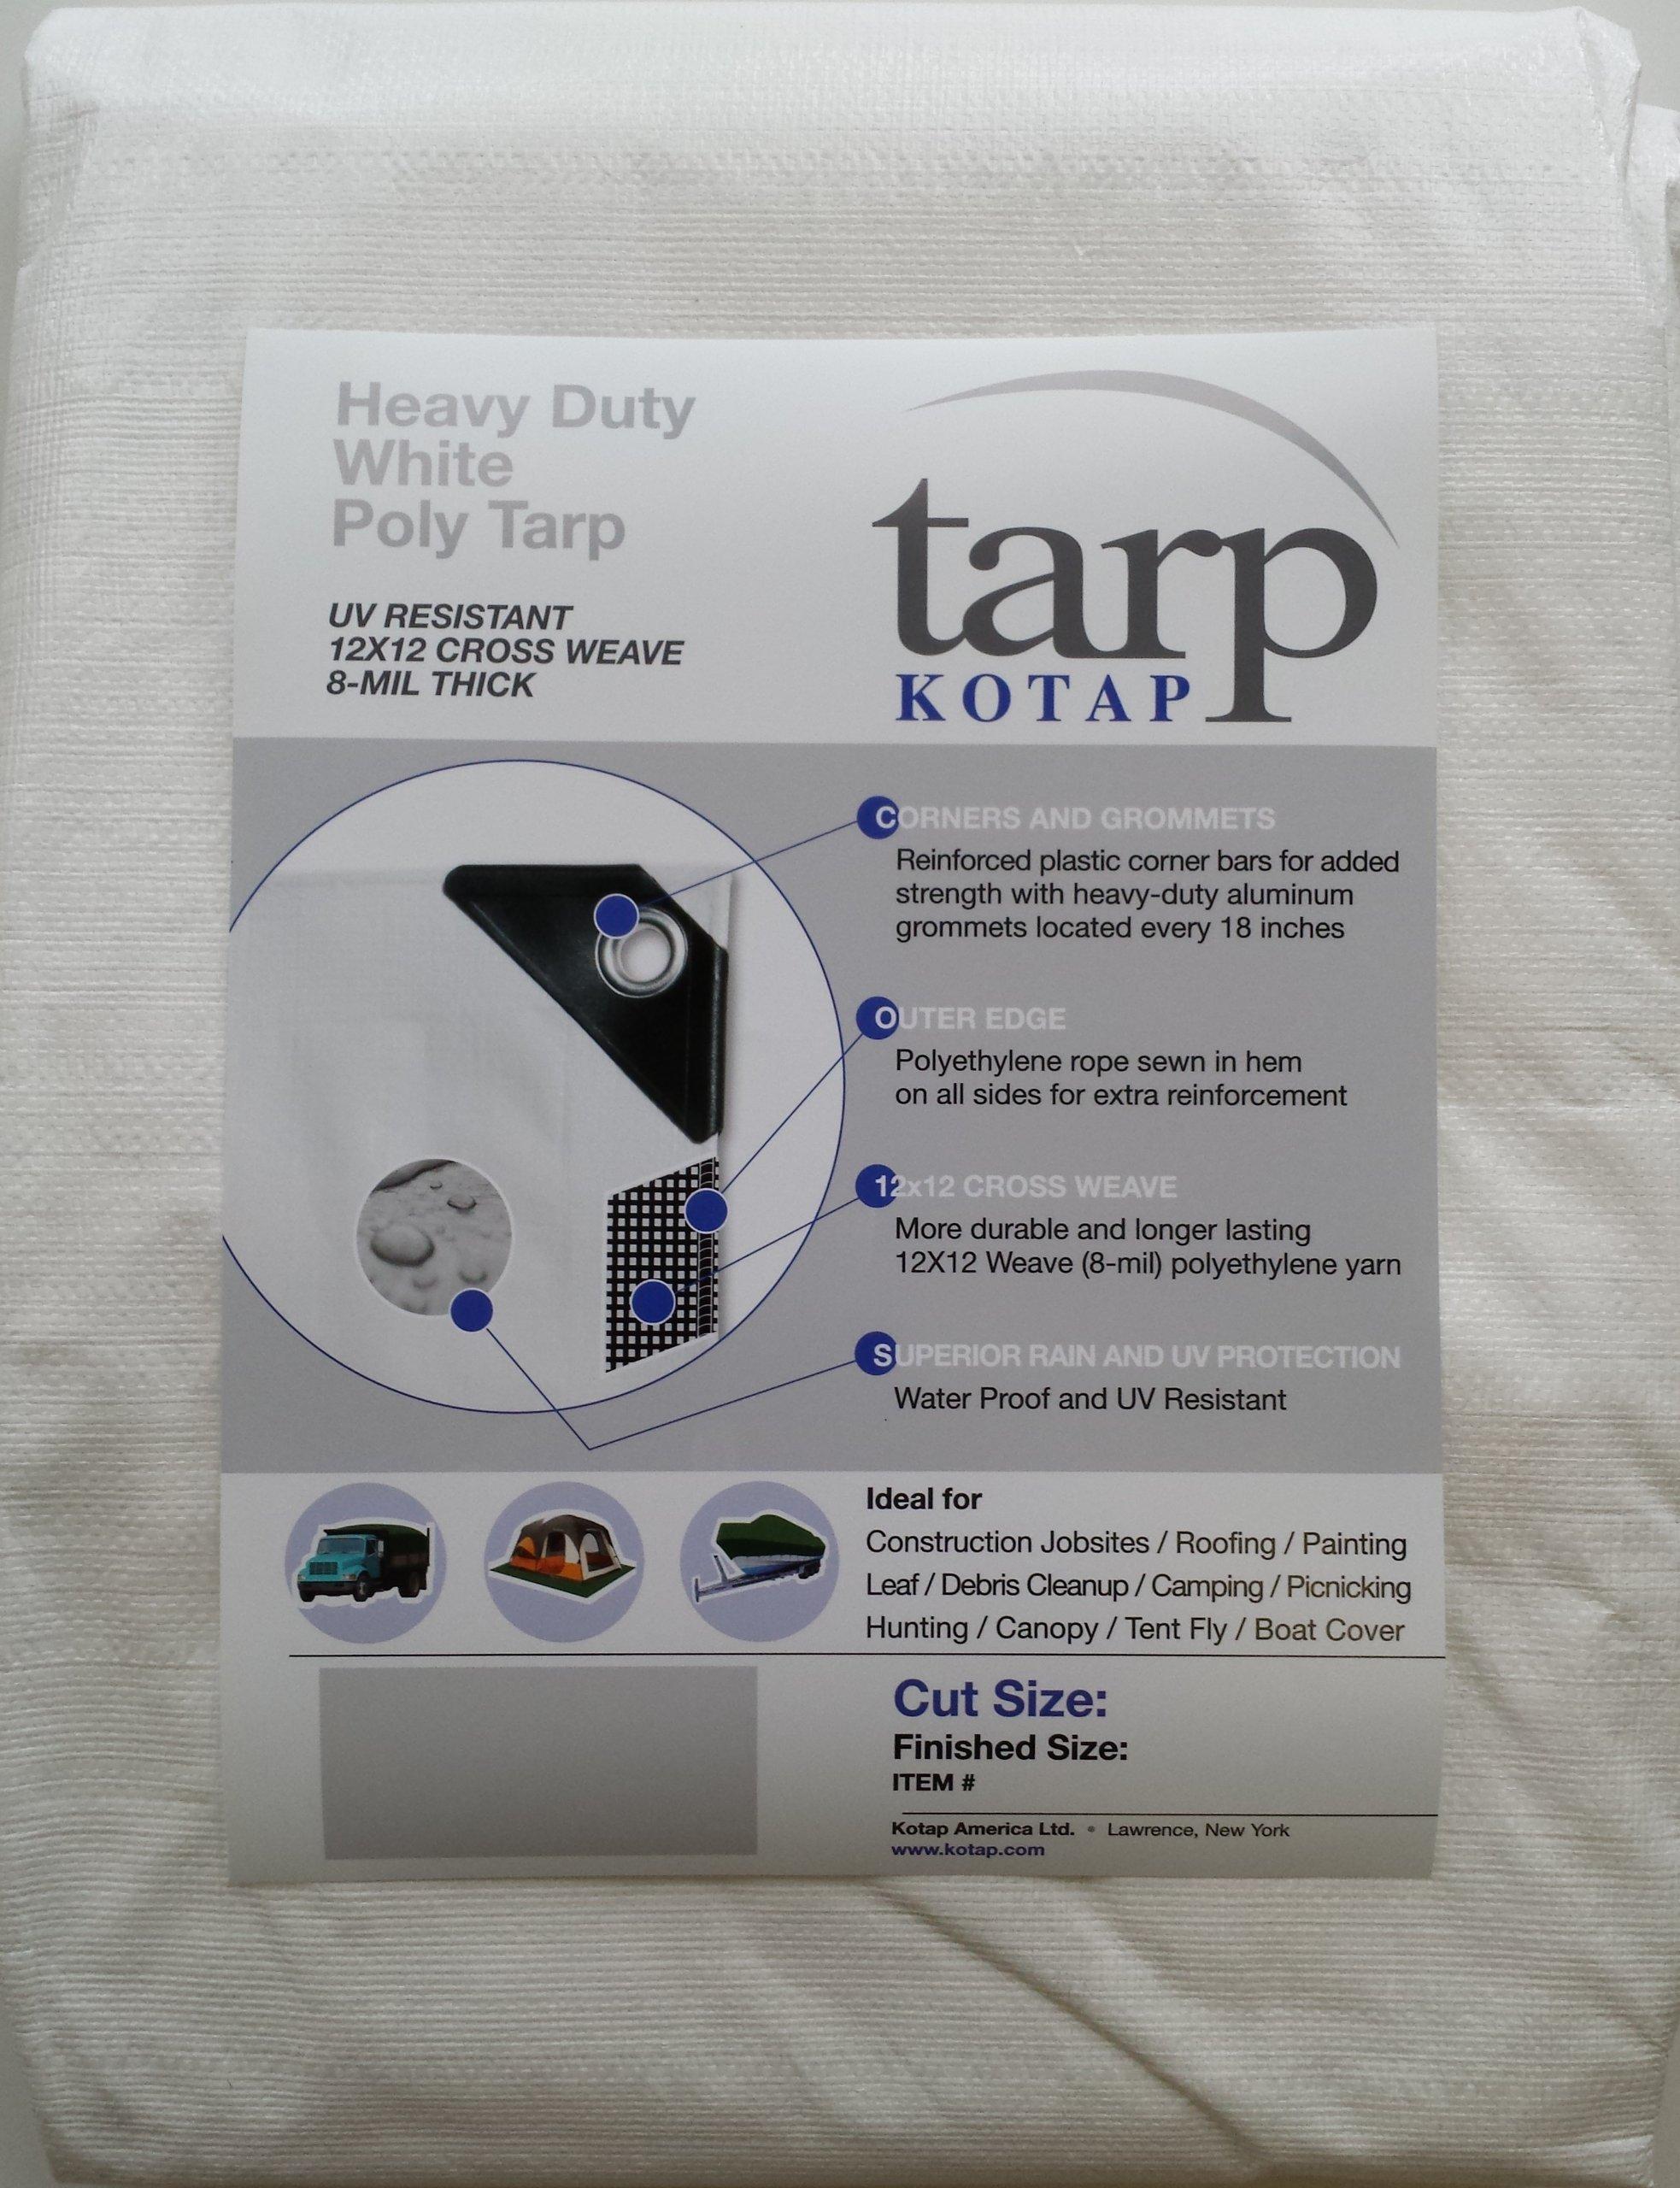 Kotap 30-ft x 50-ft Heavy-Duty 12 by 12 Cross Weave 8-mil White Poly Tarp, Item: TRW-3050 by Kotap